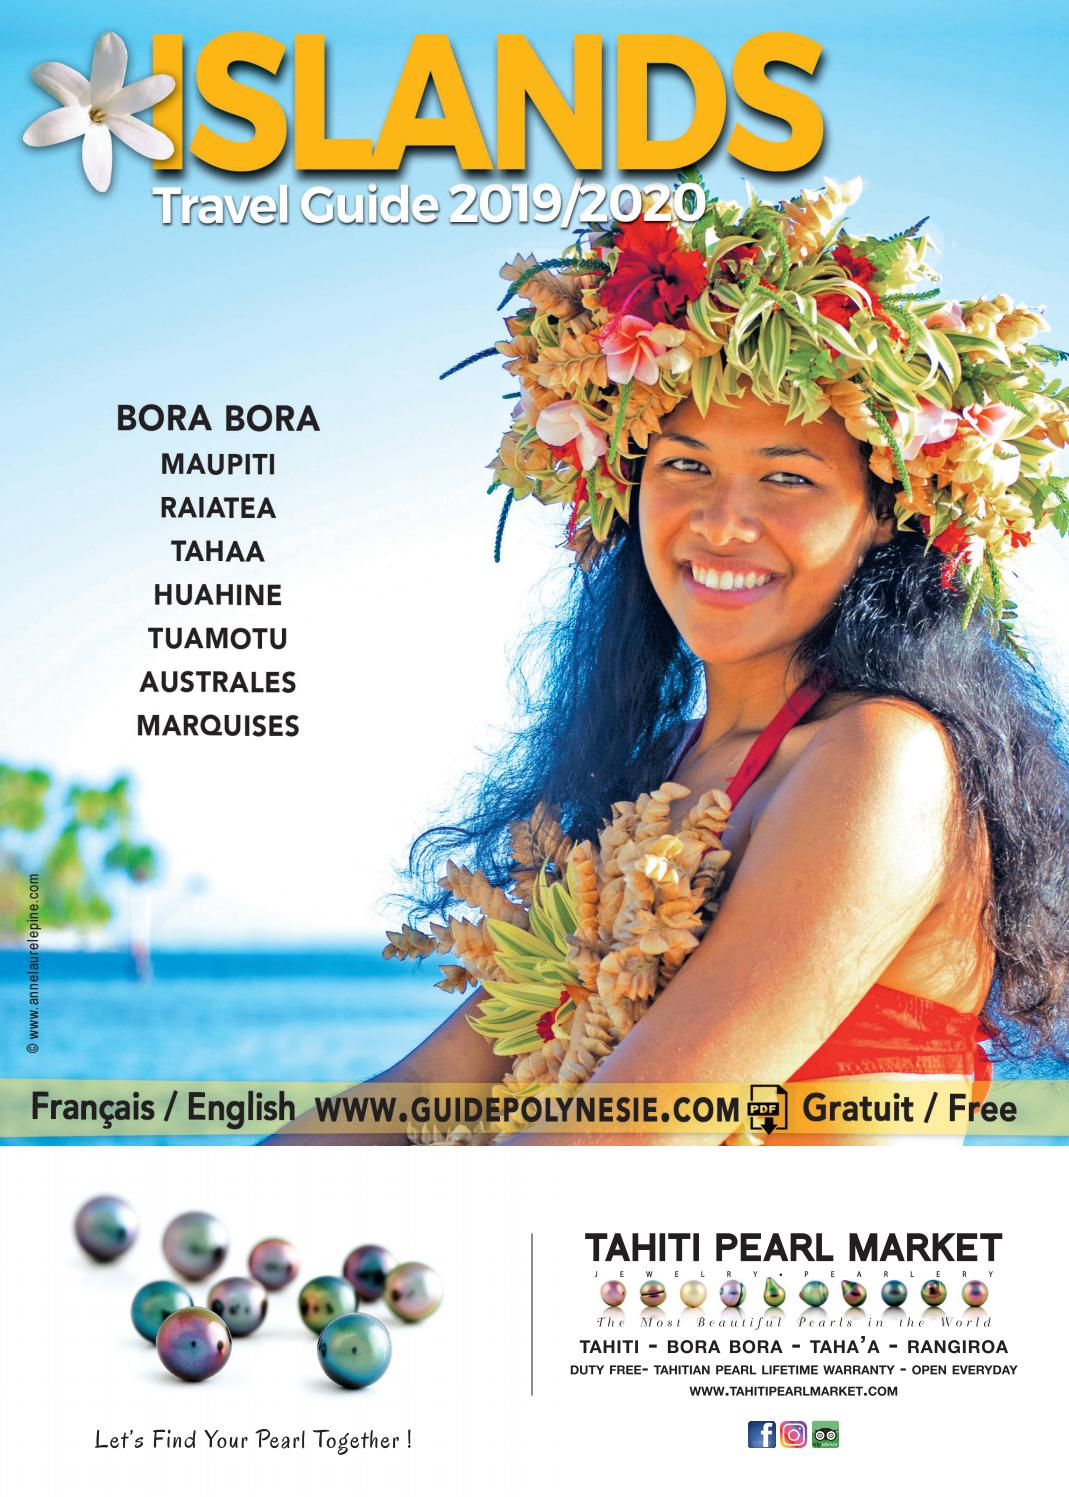 Islands Travel Guide 2019/2020 by BORA BORA SUN - issuu